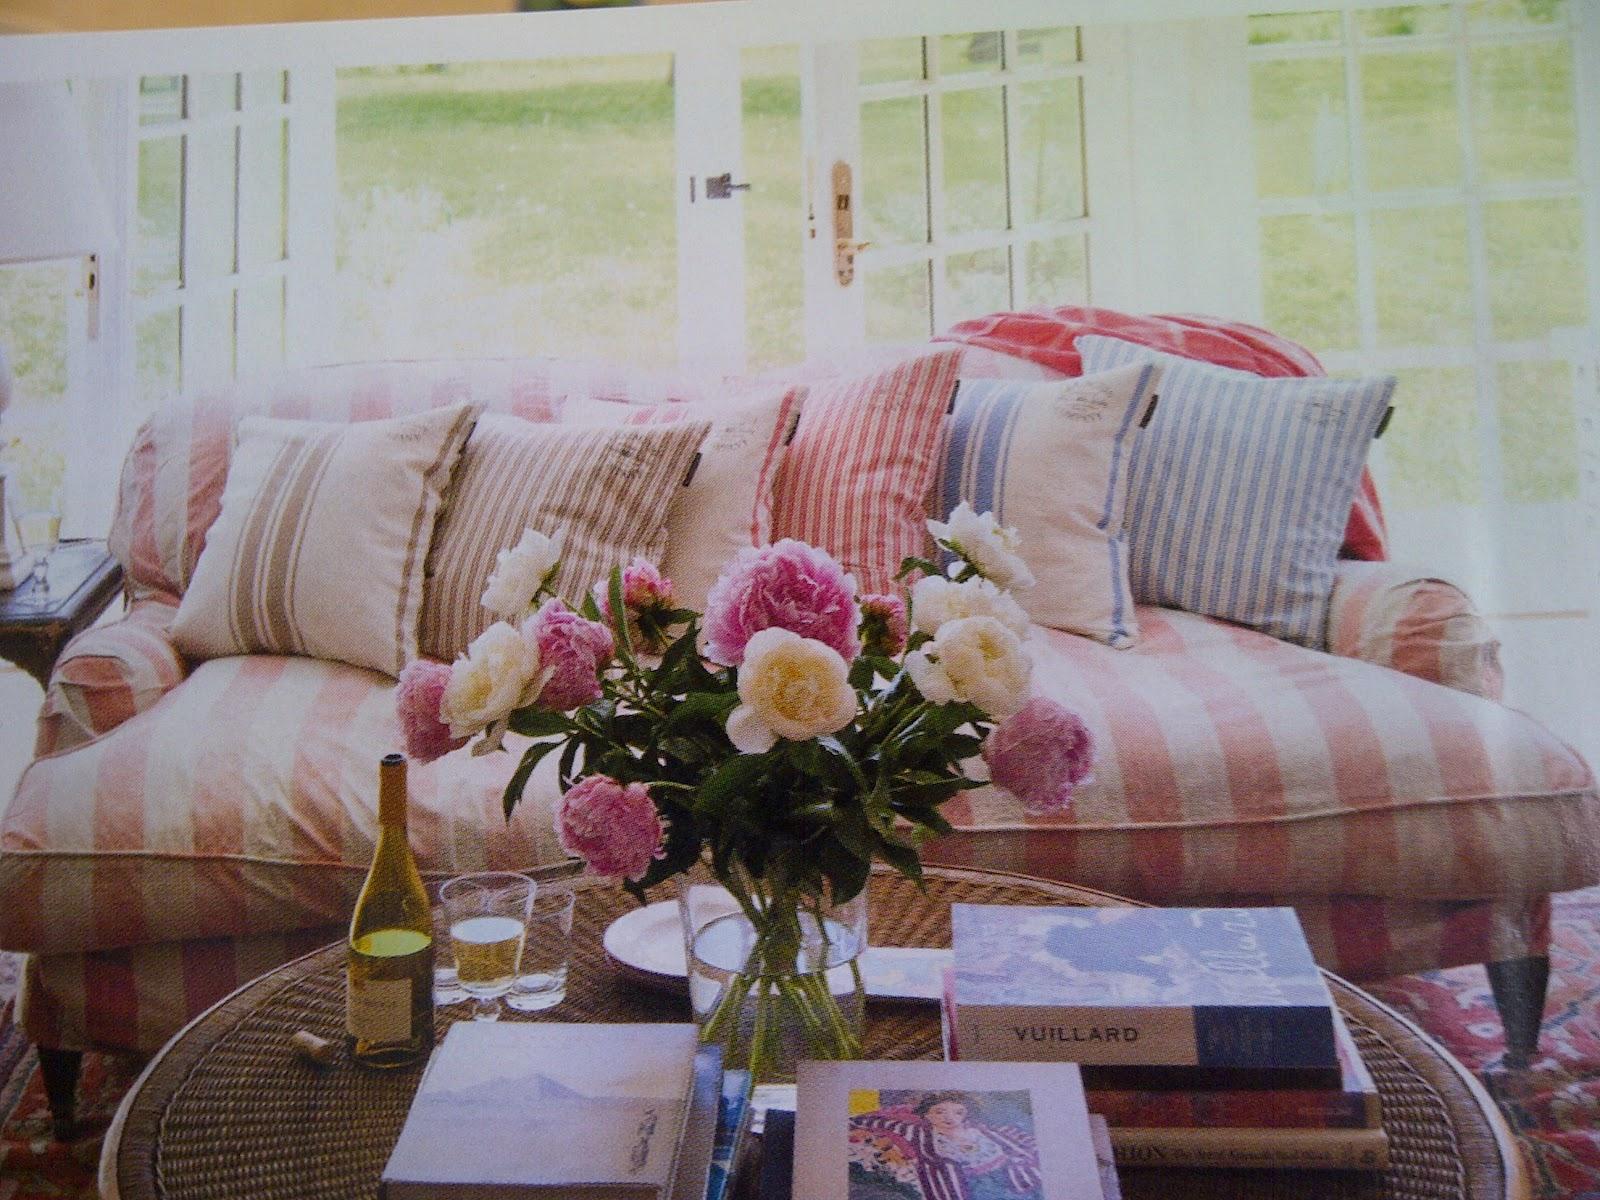 le bonheur au jardin l 39 esprit d co campagne. Black Bedroom Furniture Sets. Home Design Ideas